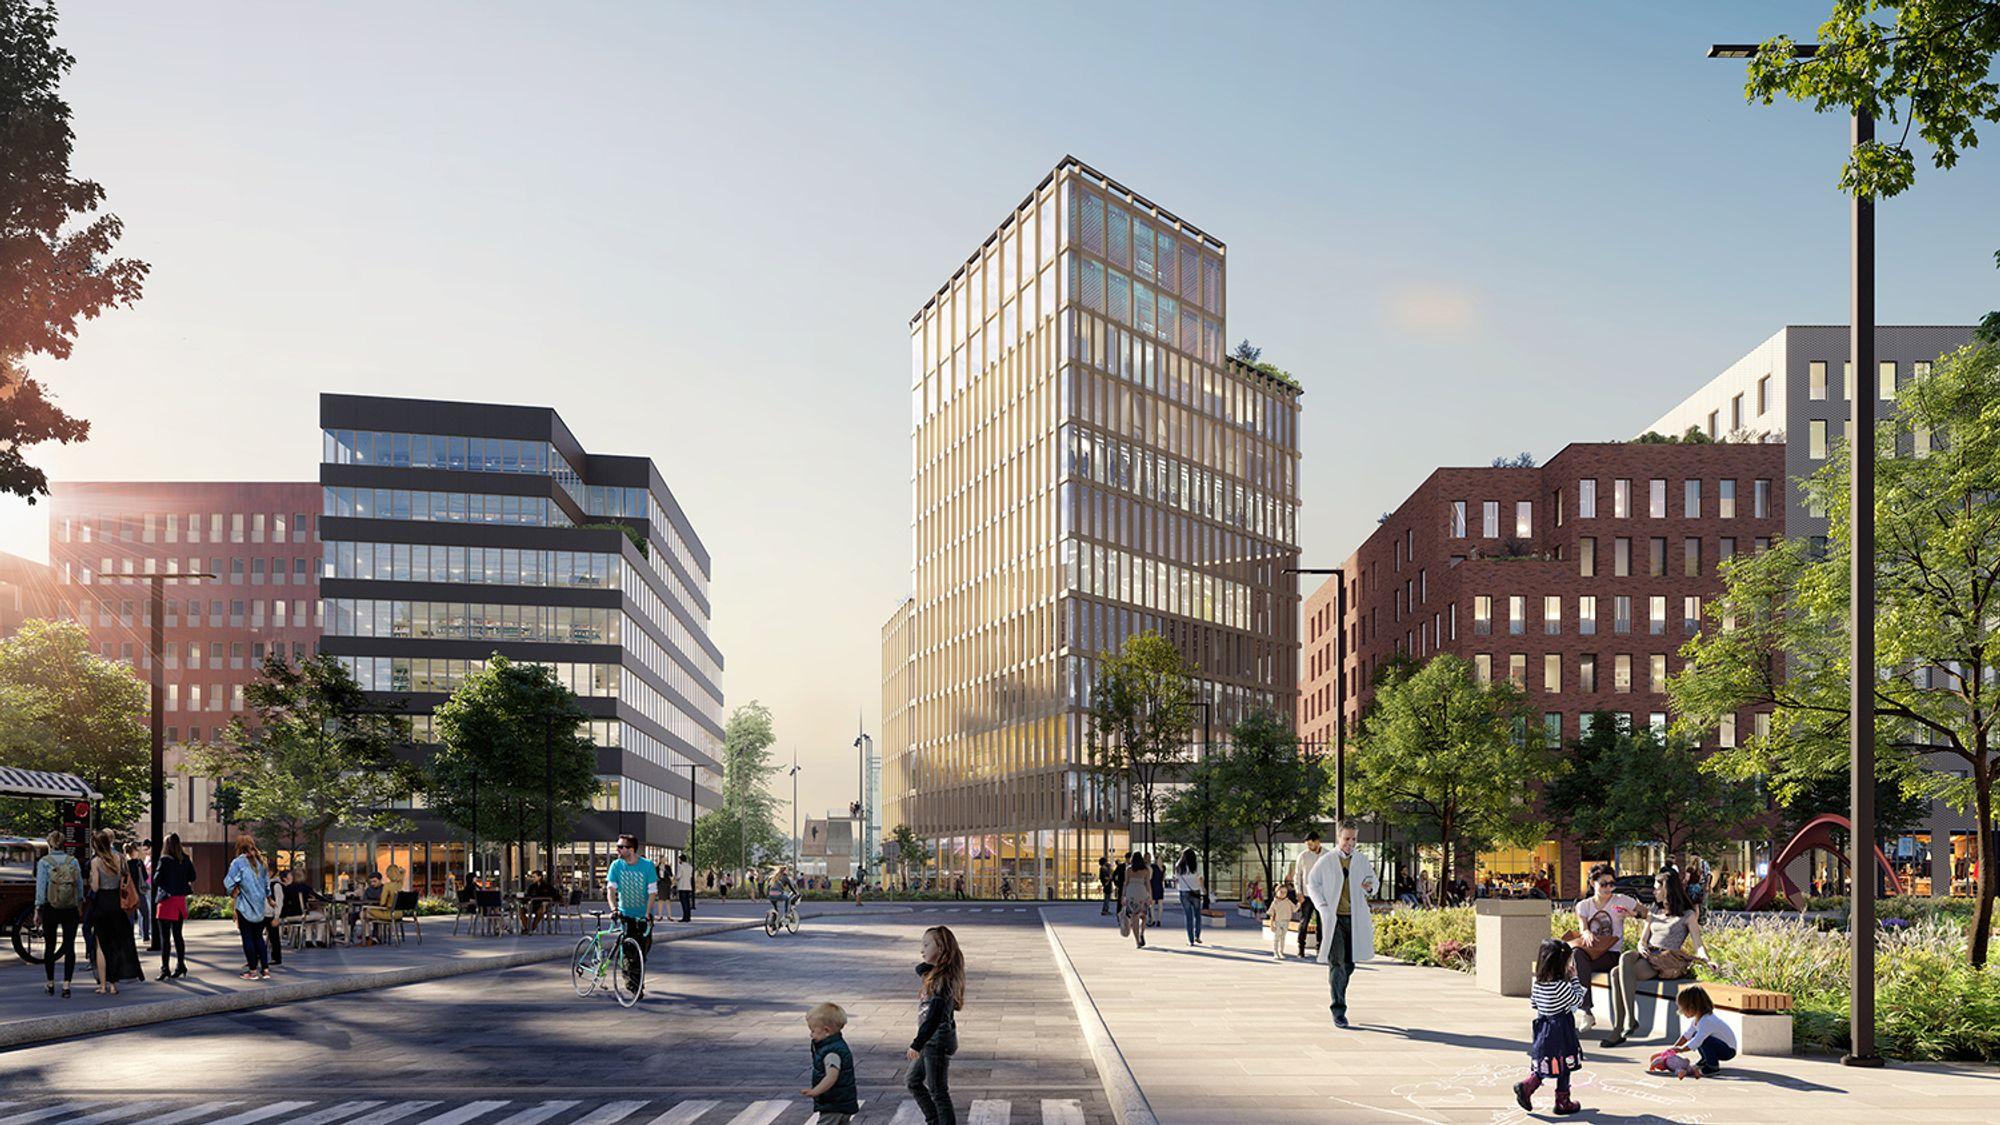 ANNONSE: Satser stort i Drammen